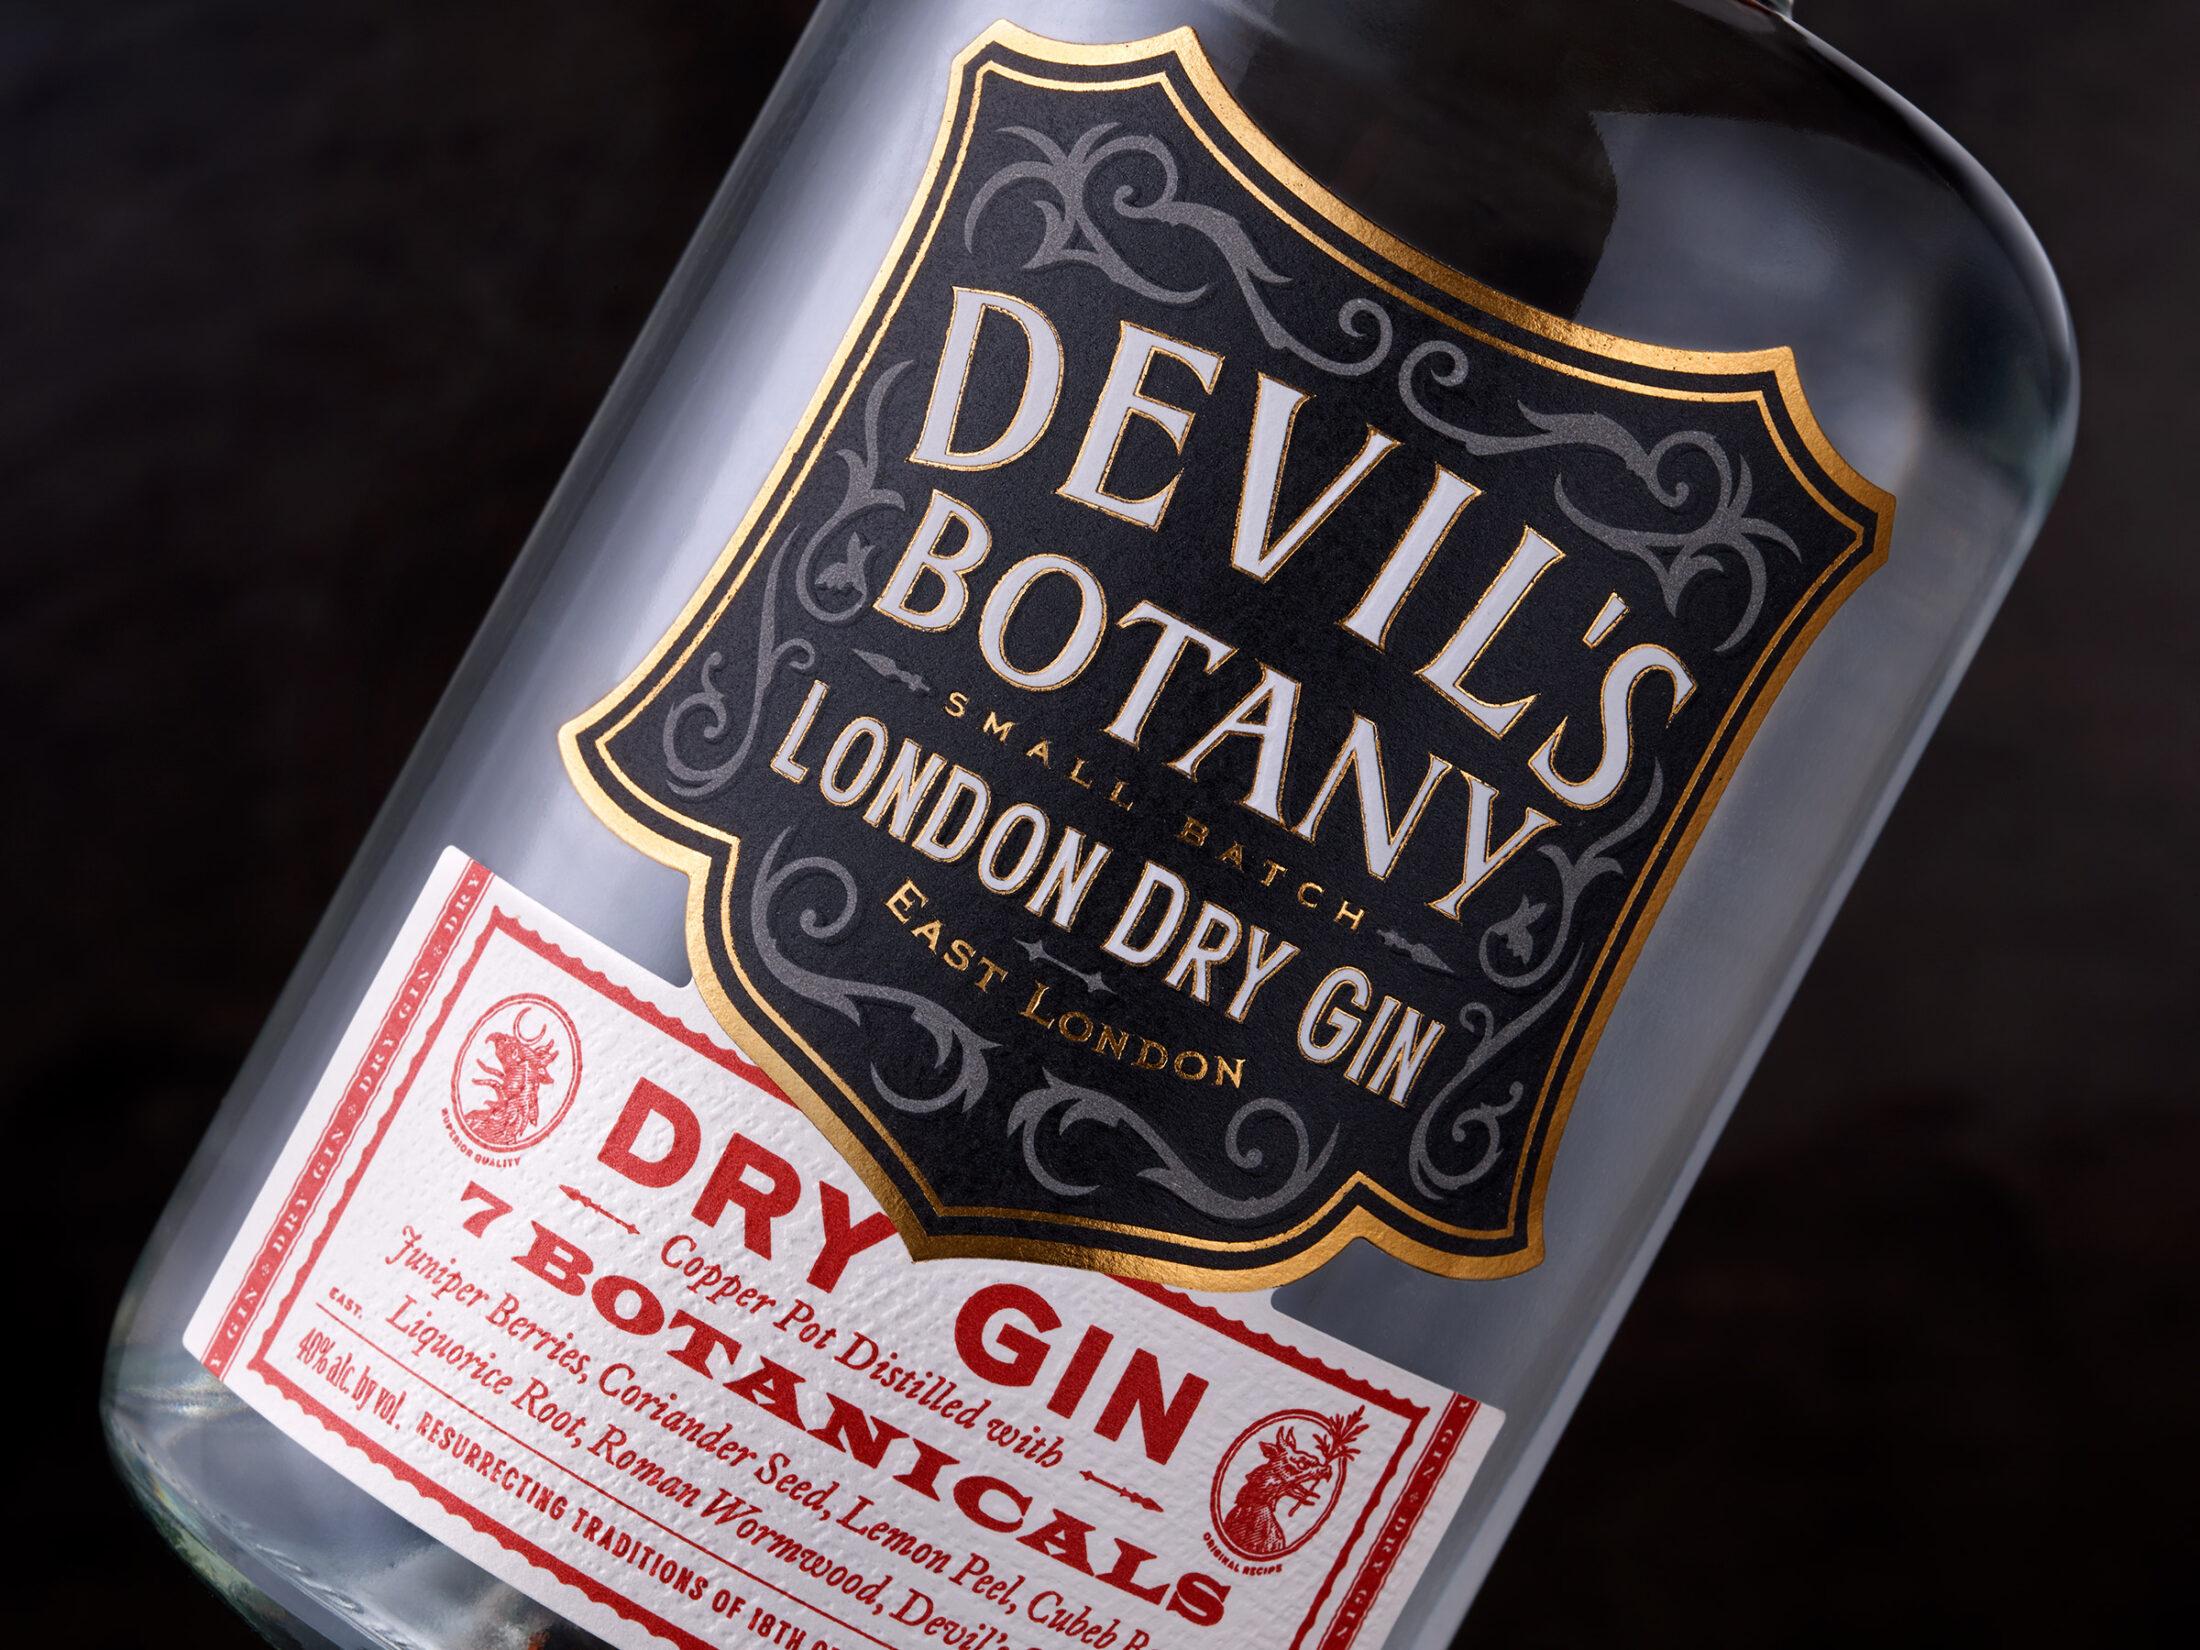 Chad Michael Studio - Devil's Botany Dry Gin